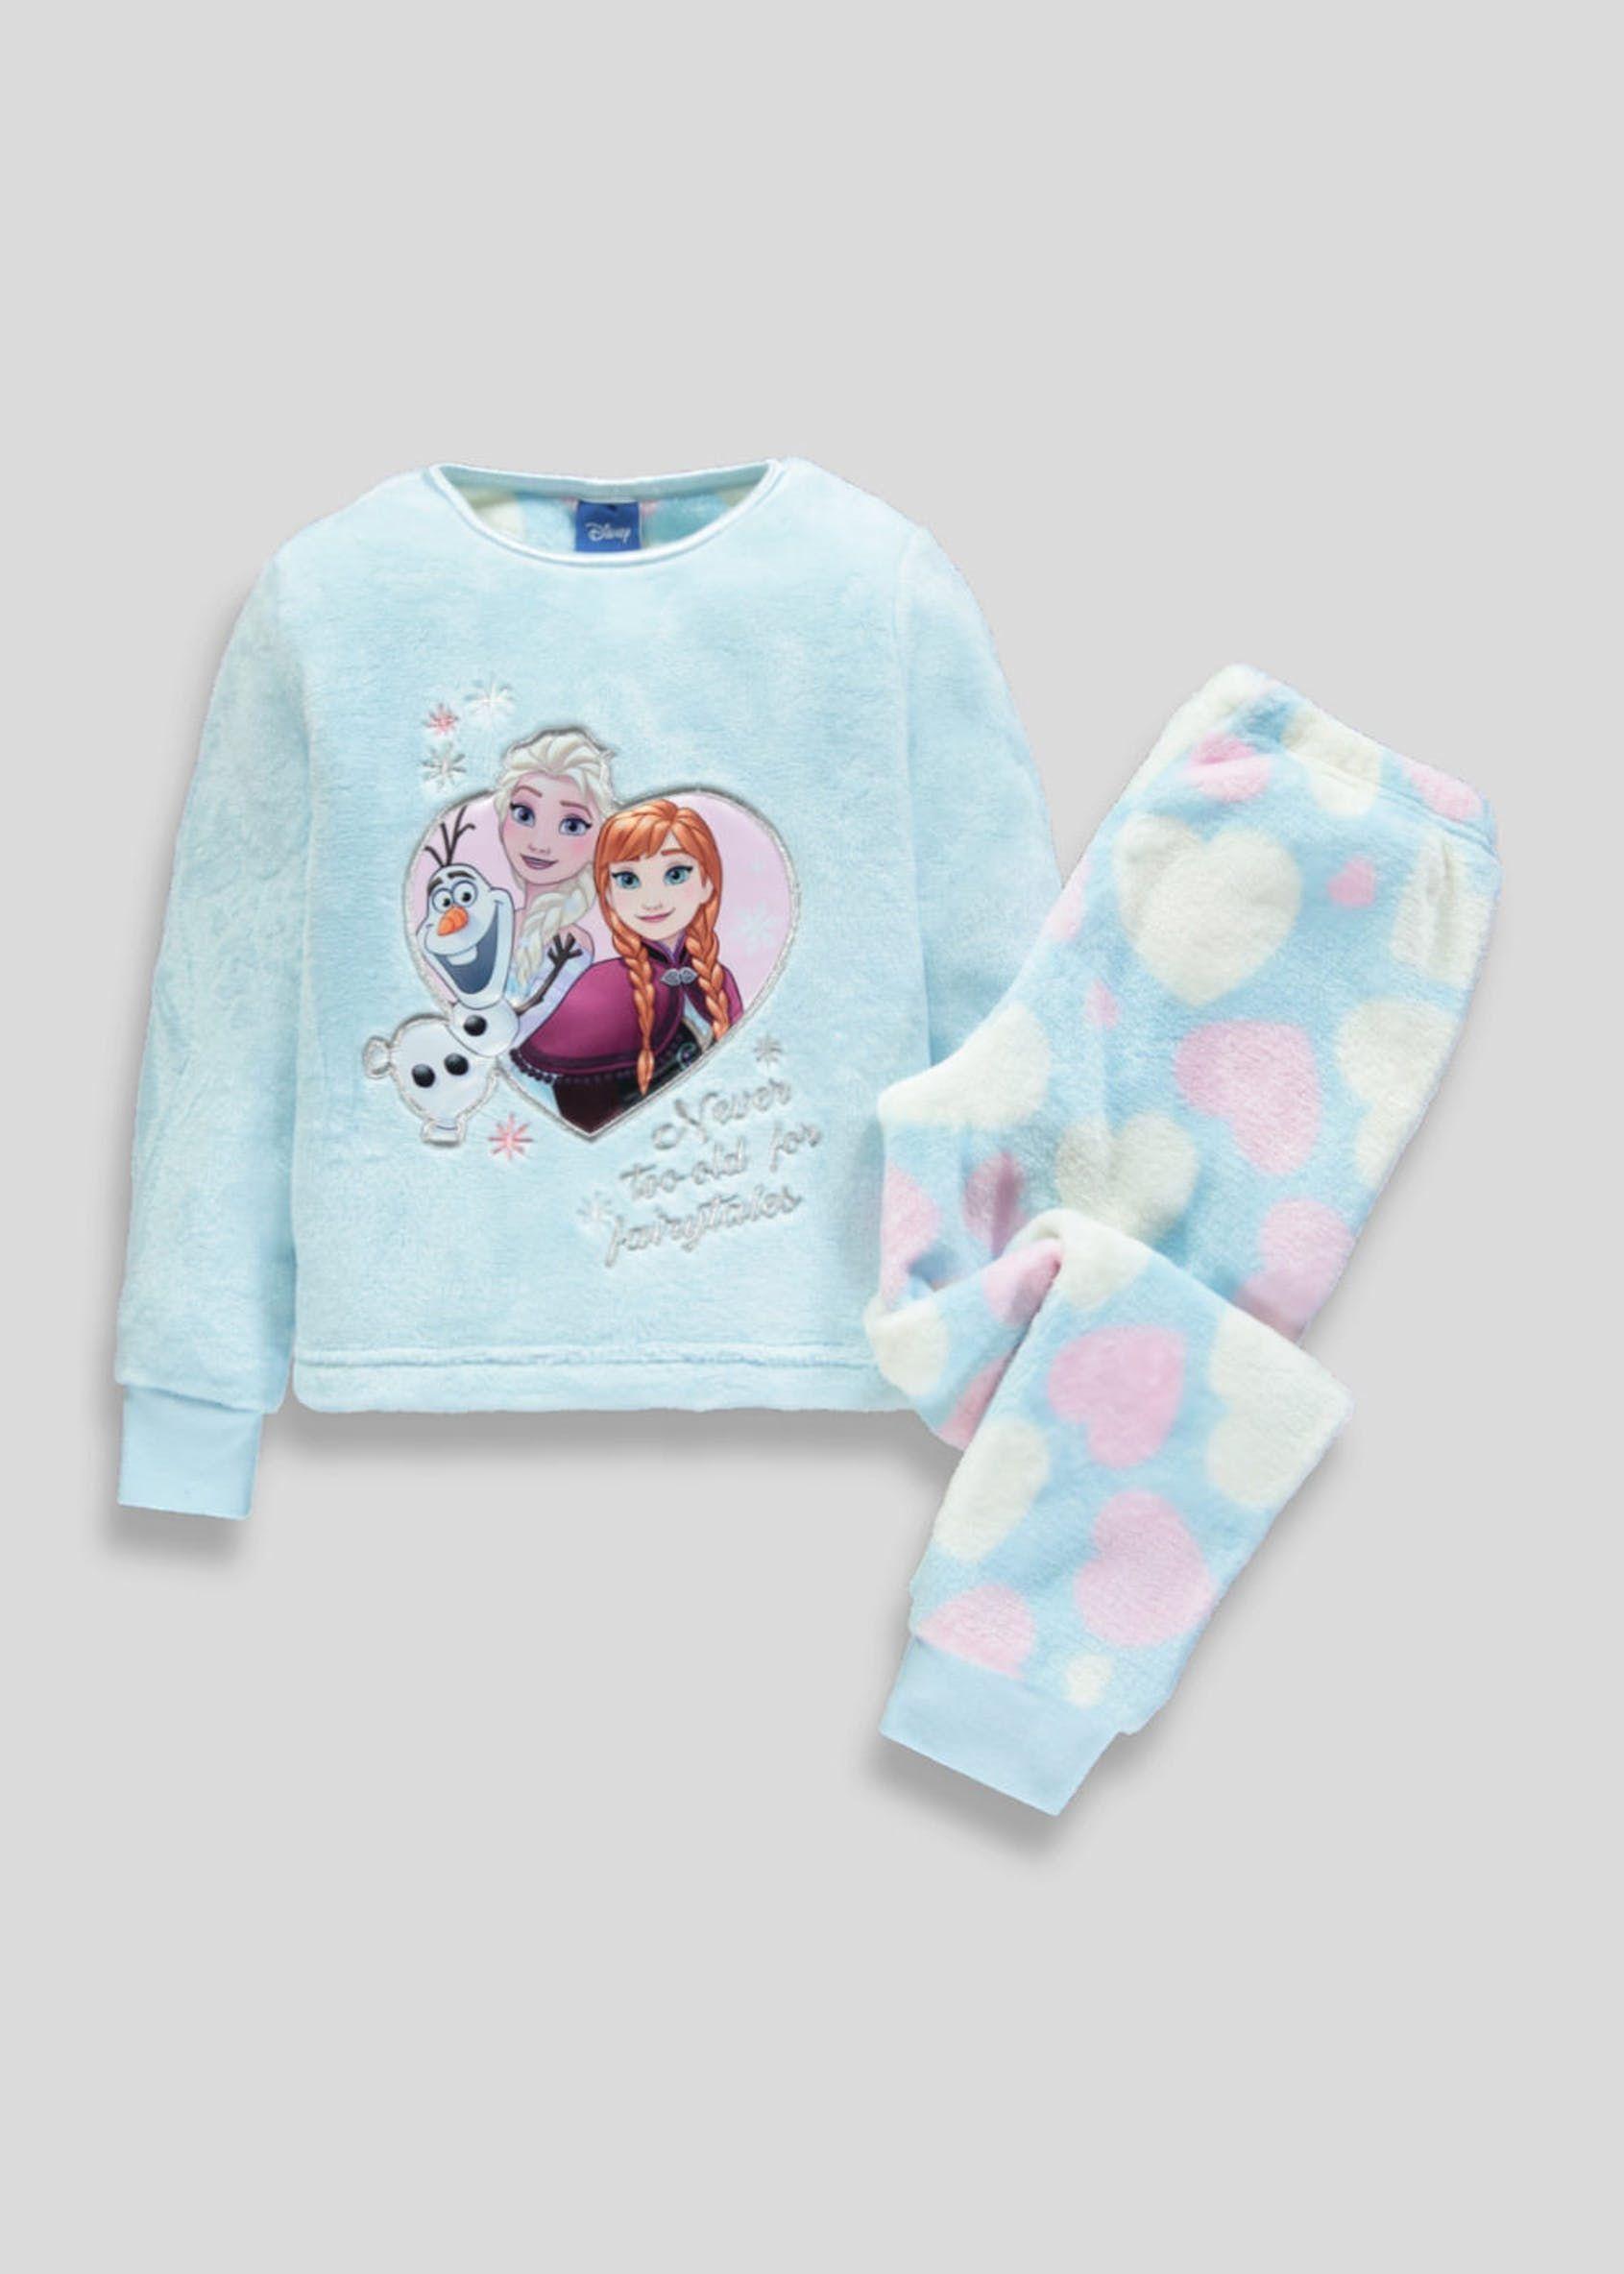 Elsa Disney Frozen Girls Blue Fleece Sleep /& Lounge Pants Pajamas Bottoms